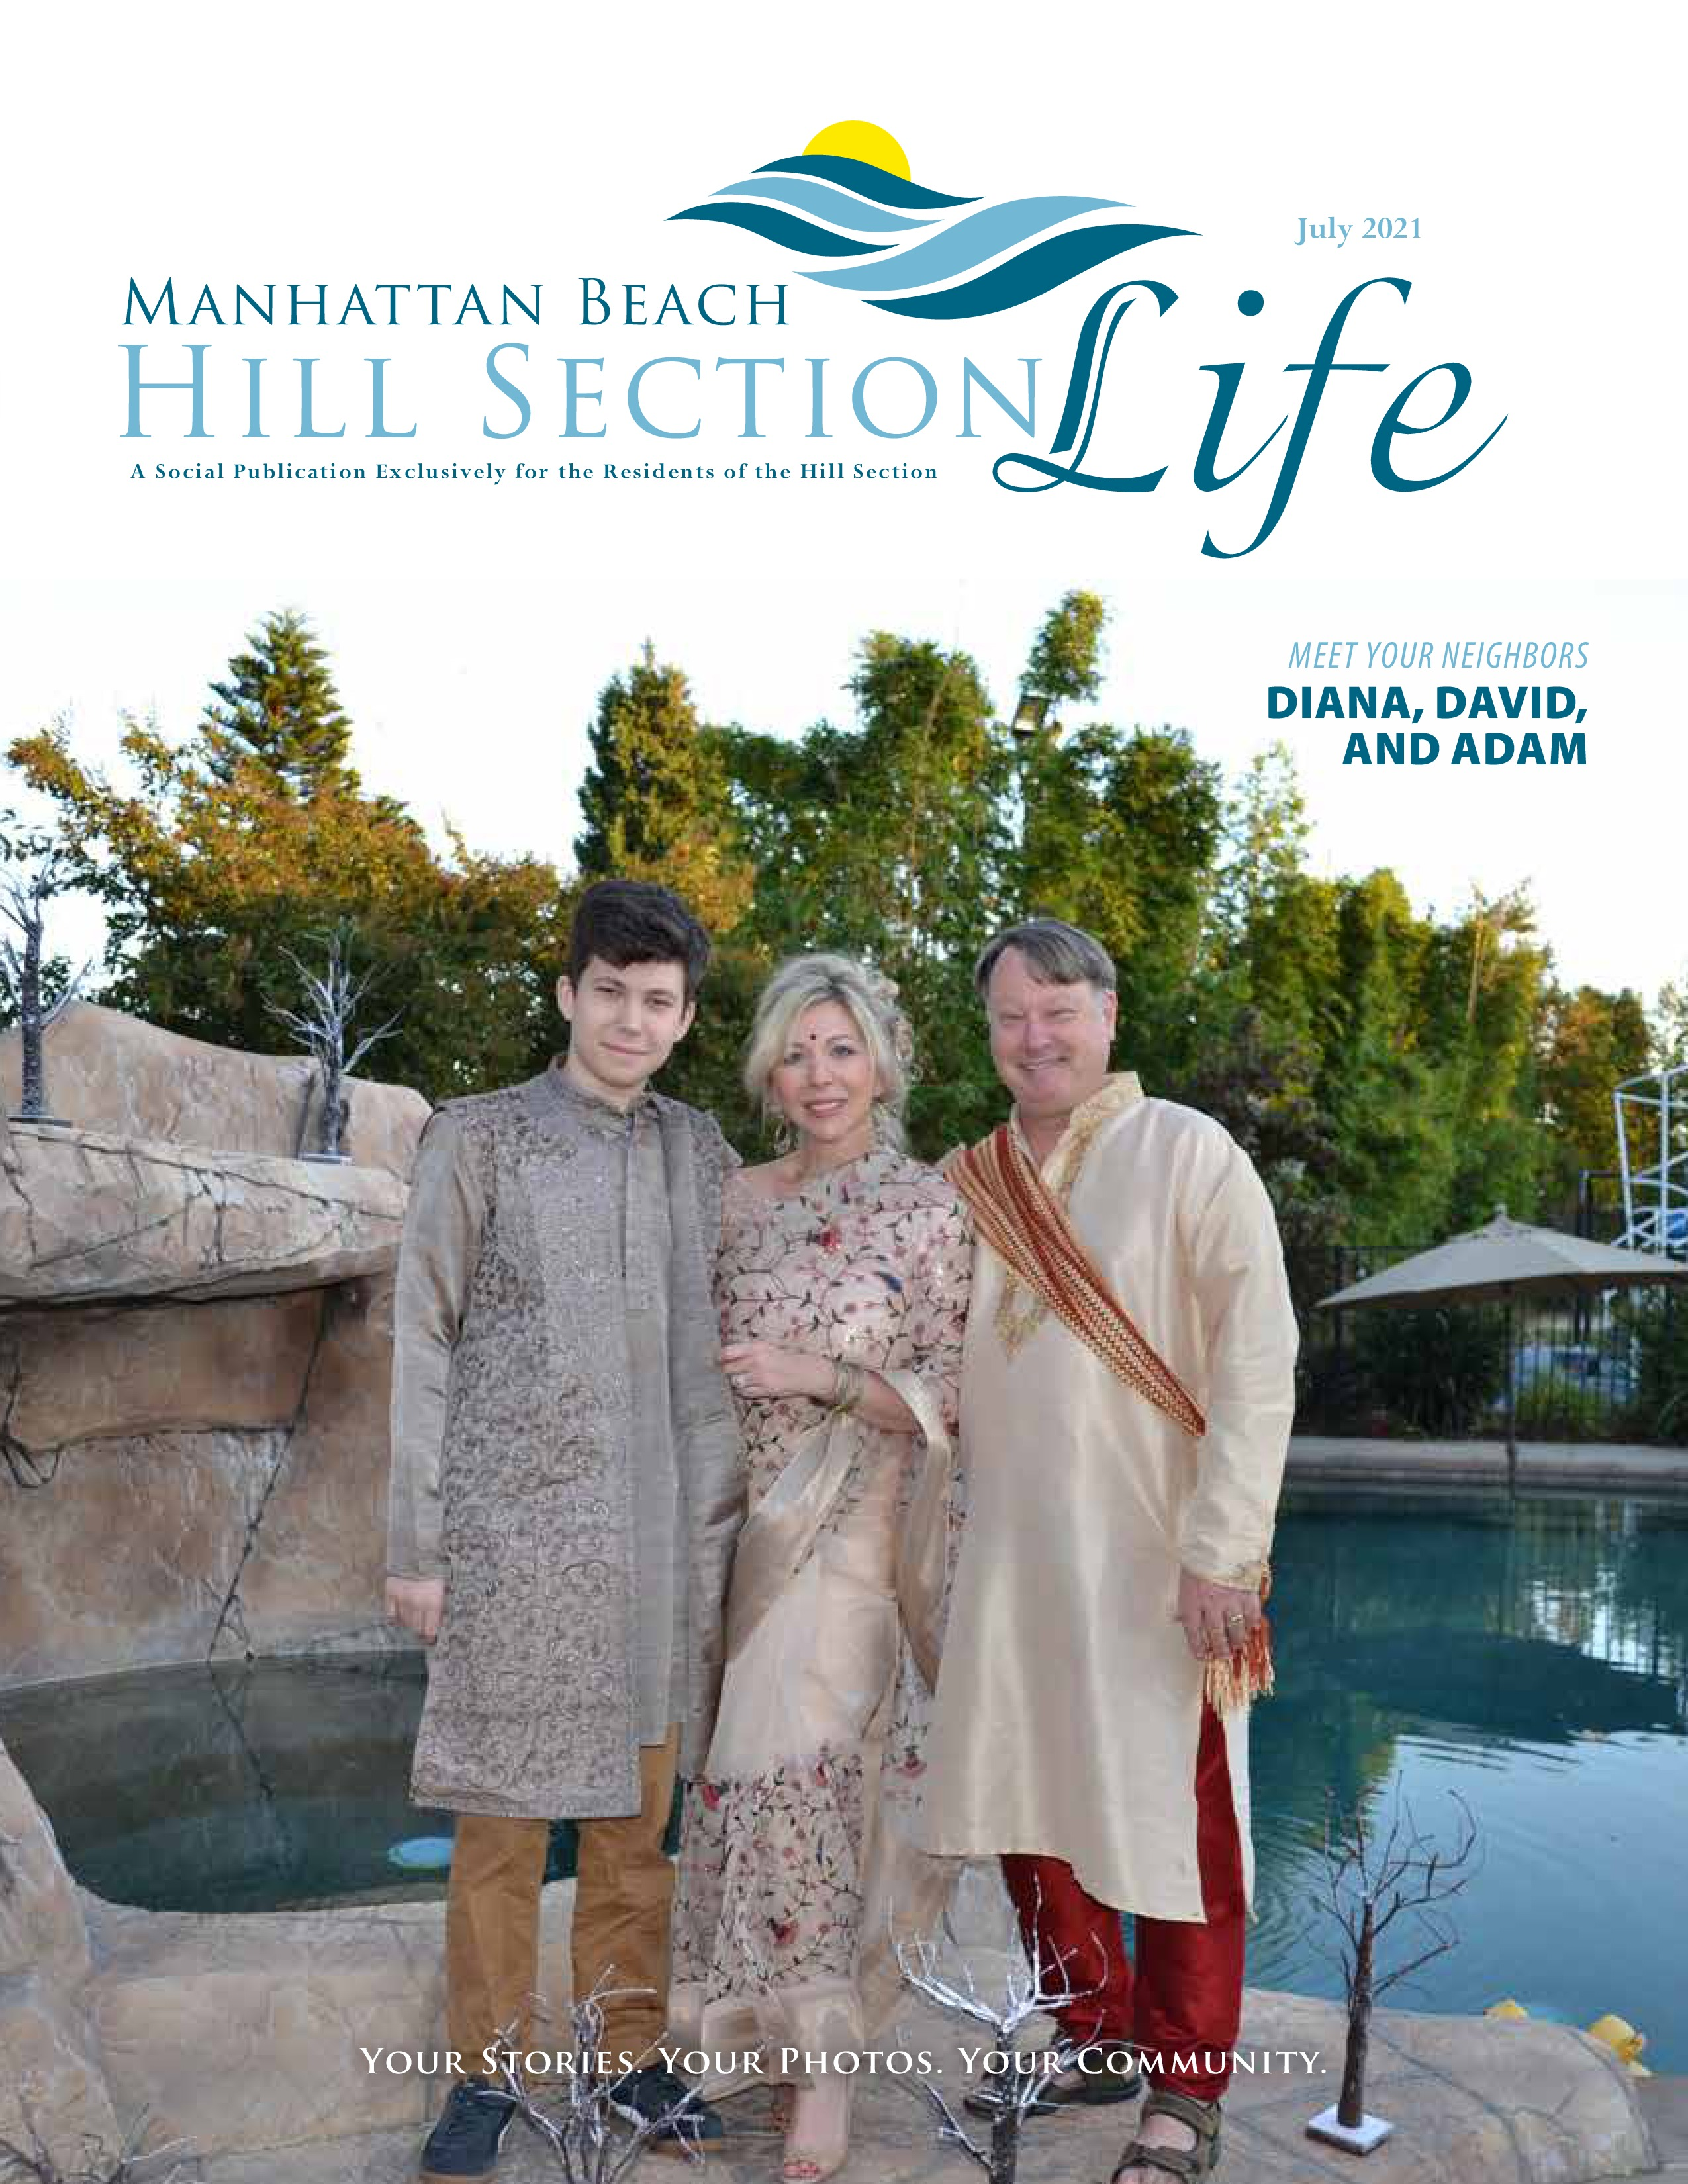 Manhattan Beach Hill Section Life 2021-07-01